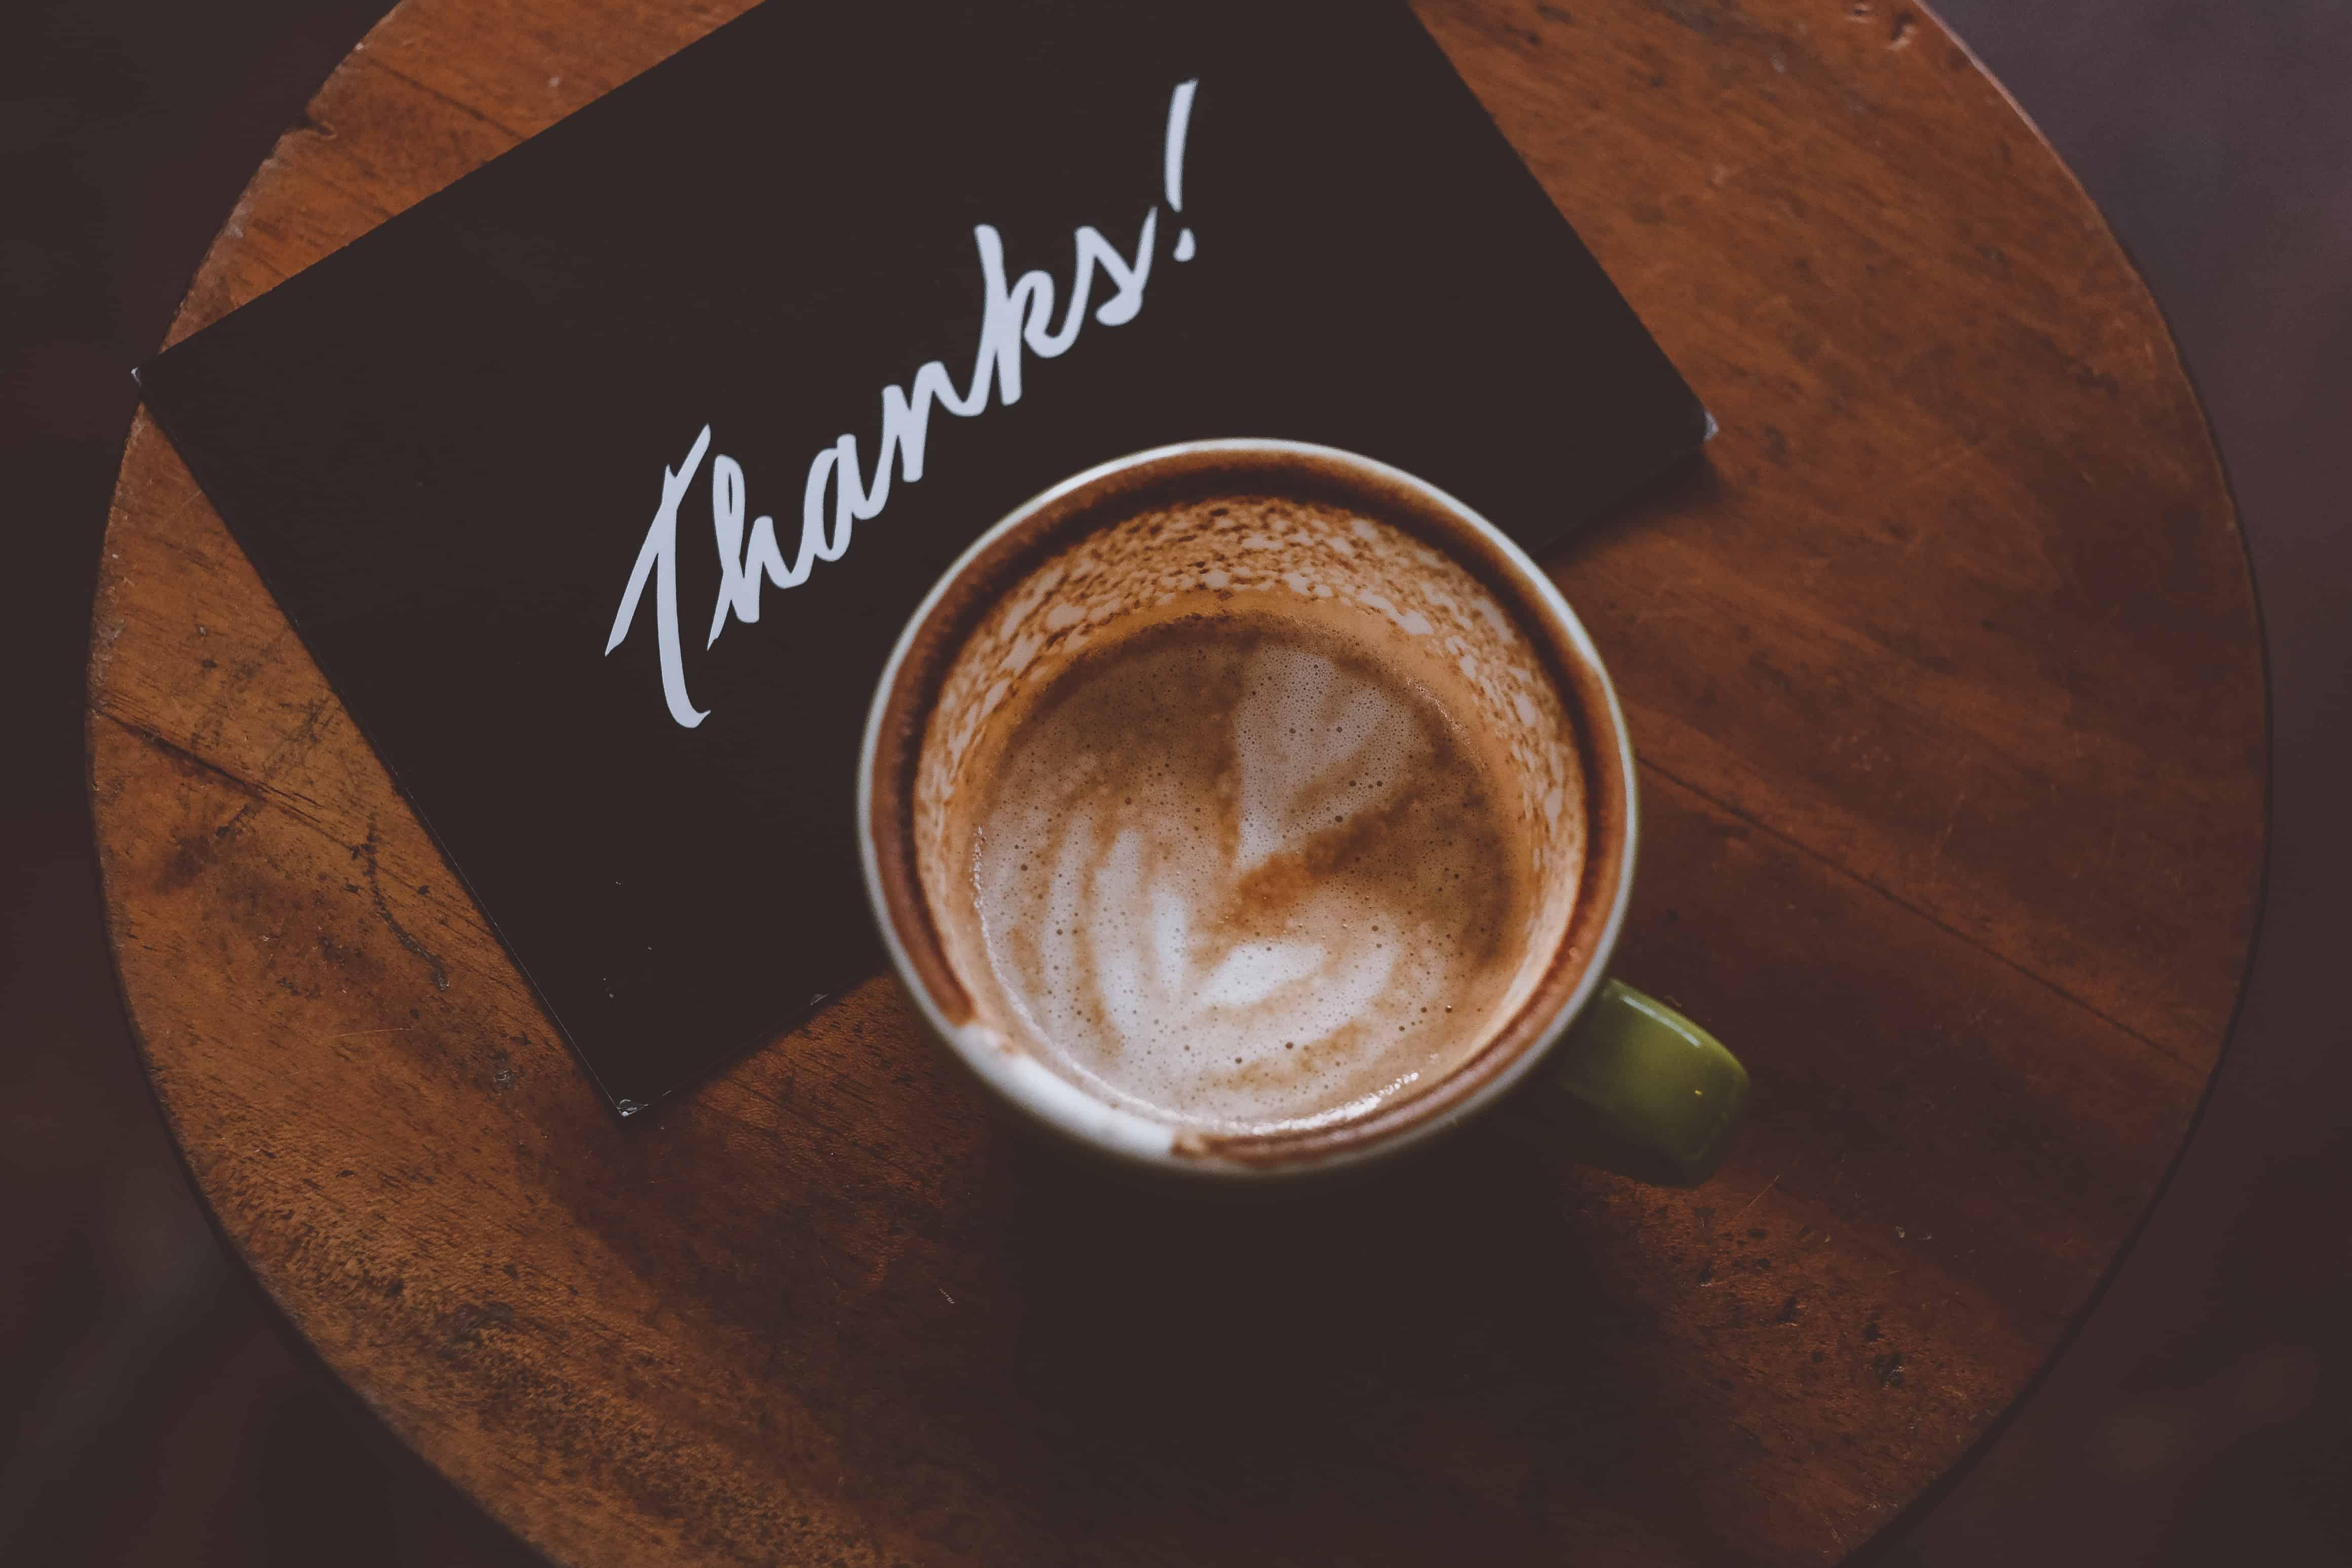 gratitude work